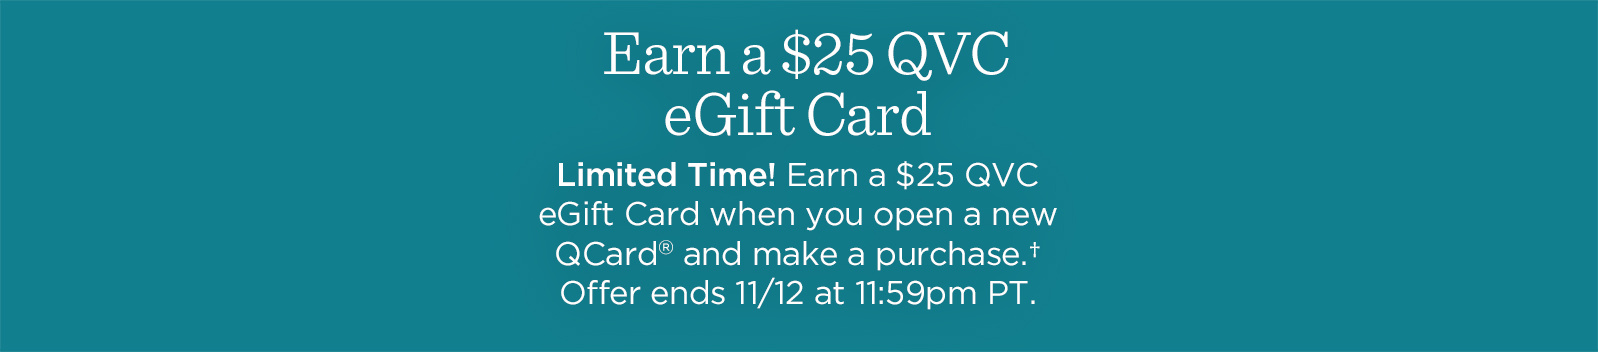 ge capital home design credit card phone number : gigaclub.co